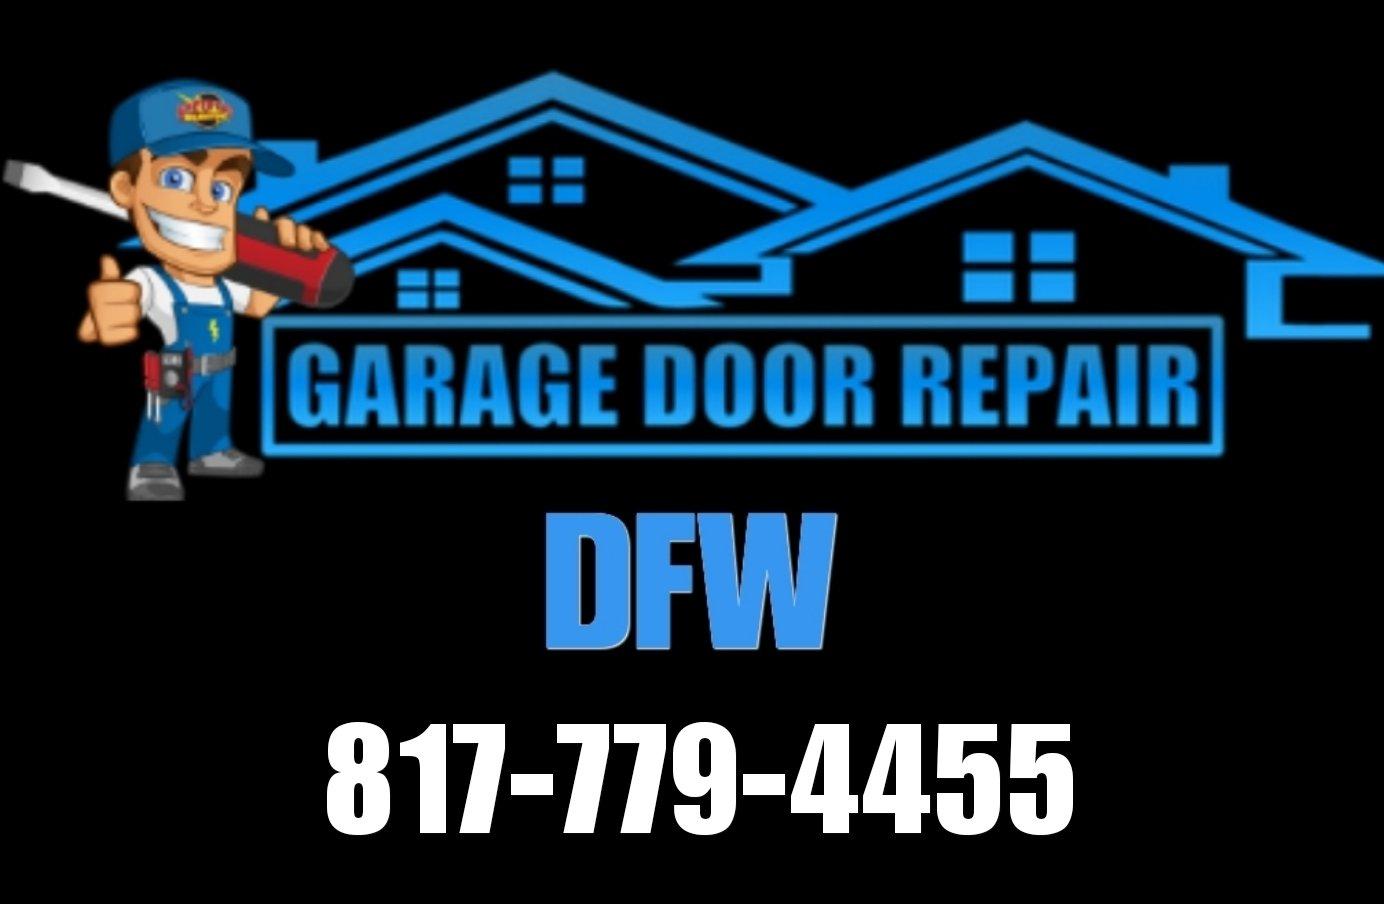 Garage Door Repair Dfw Garagedfwrepair Twitter